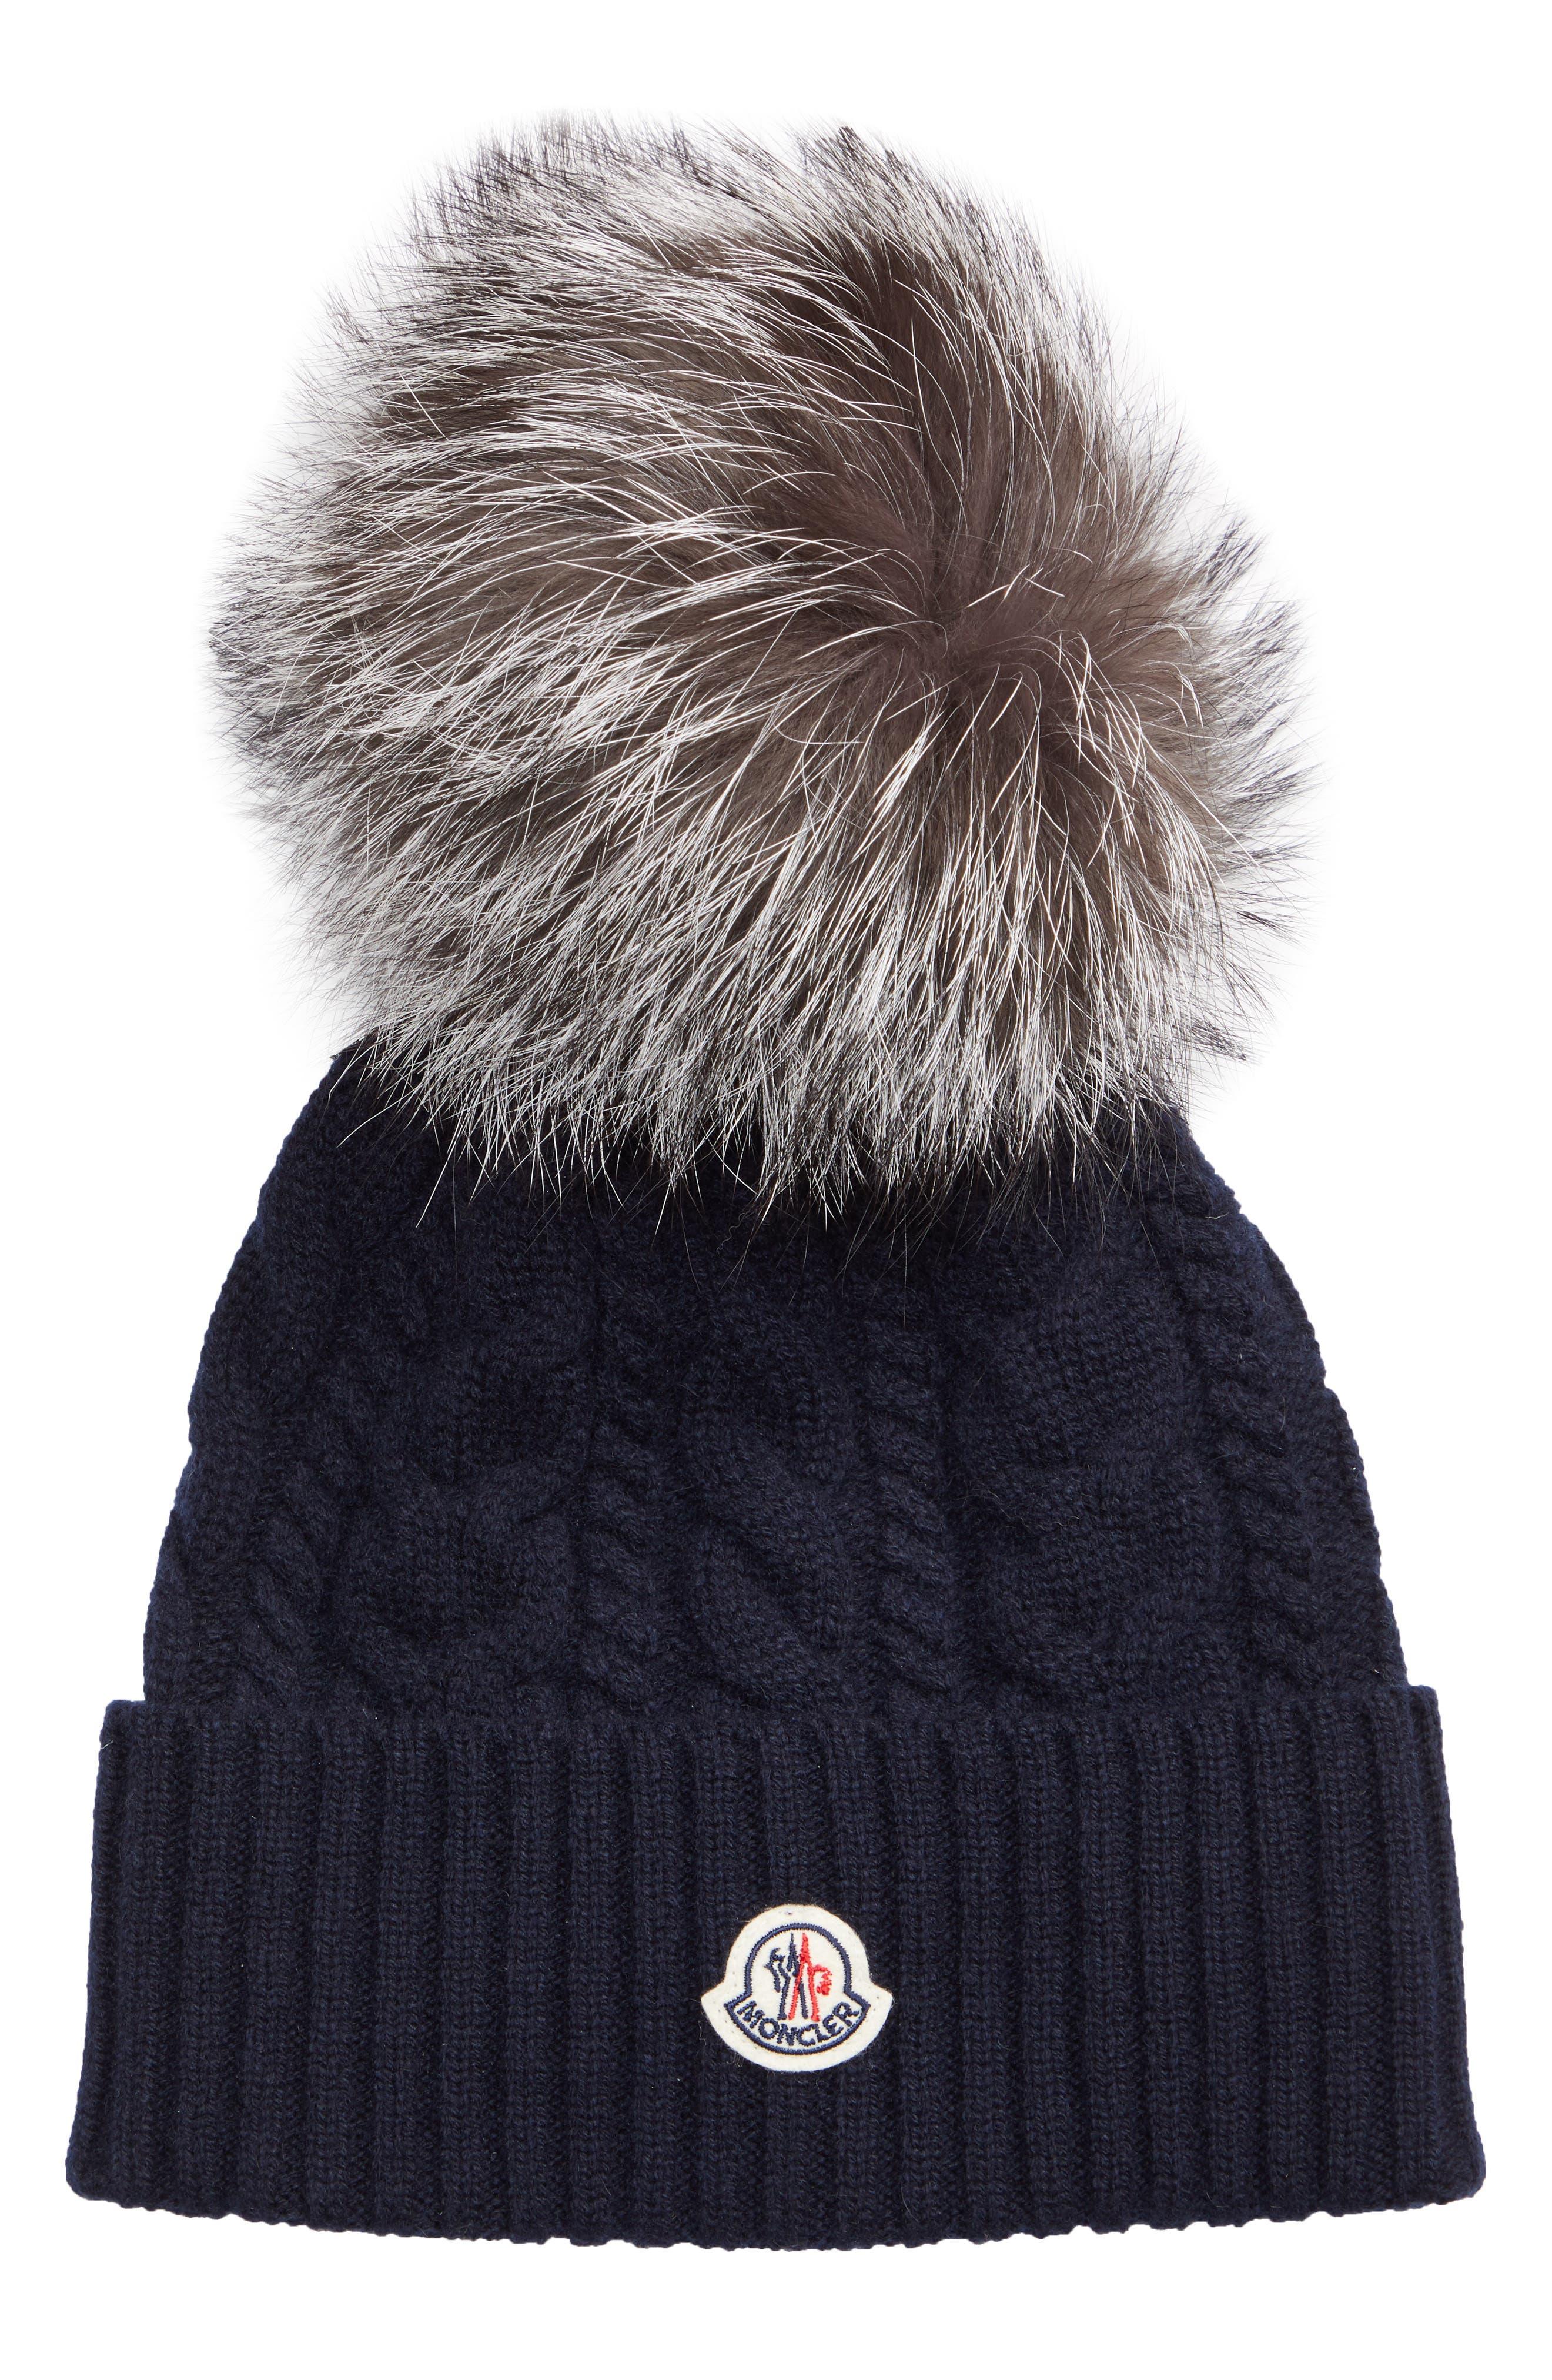 5bdeb349bc7bc Moncler Hats for Women